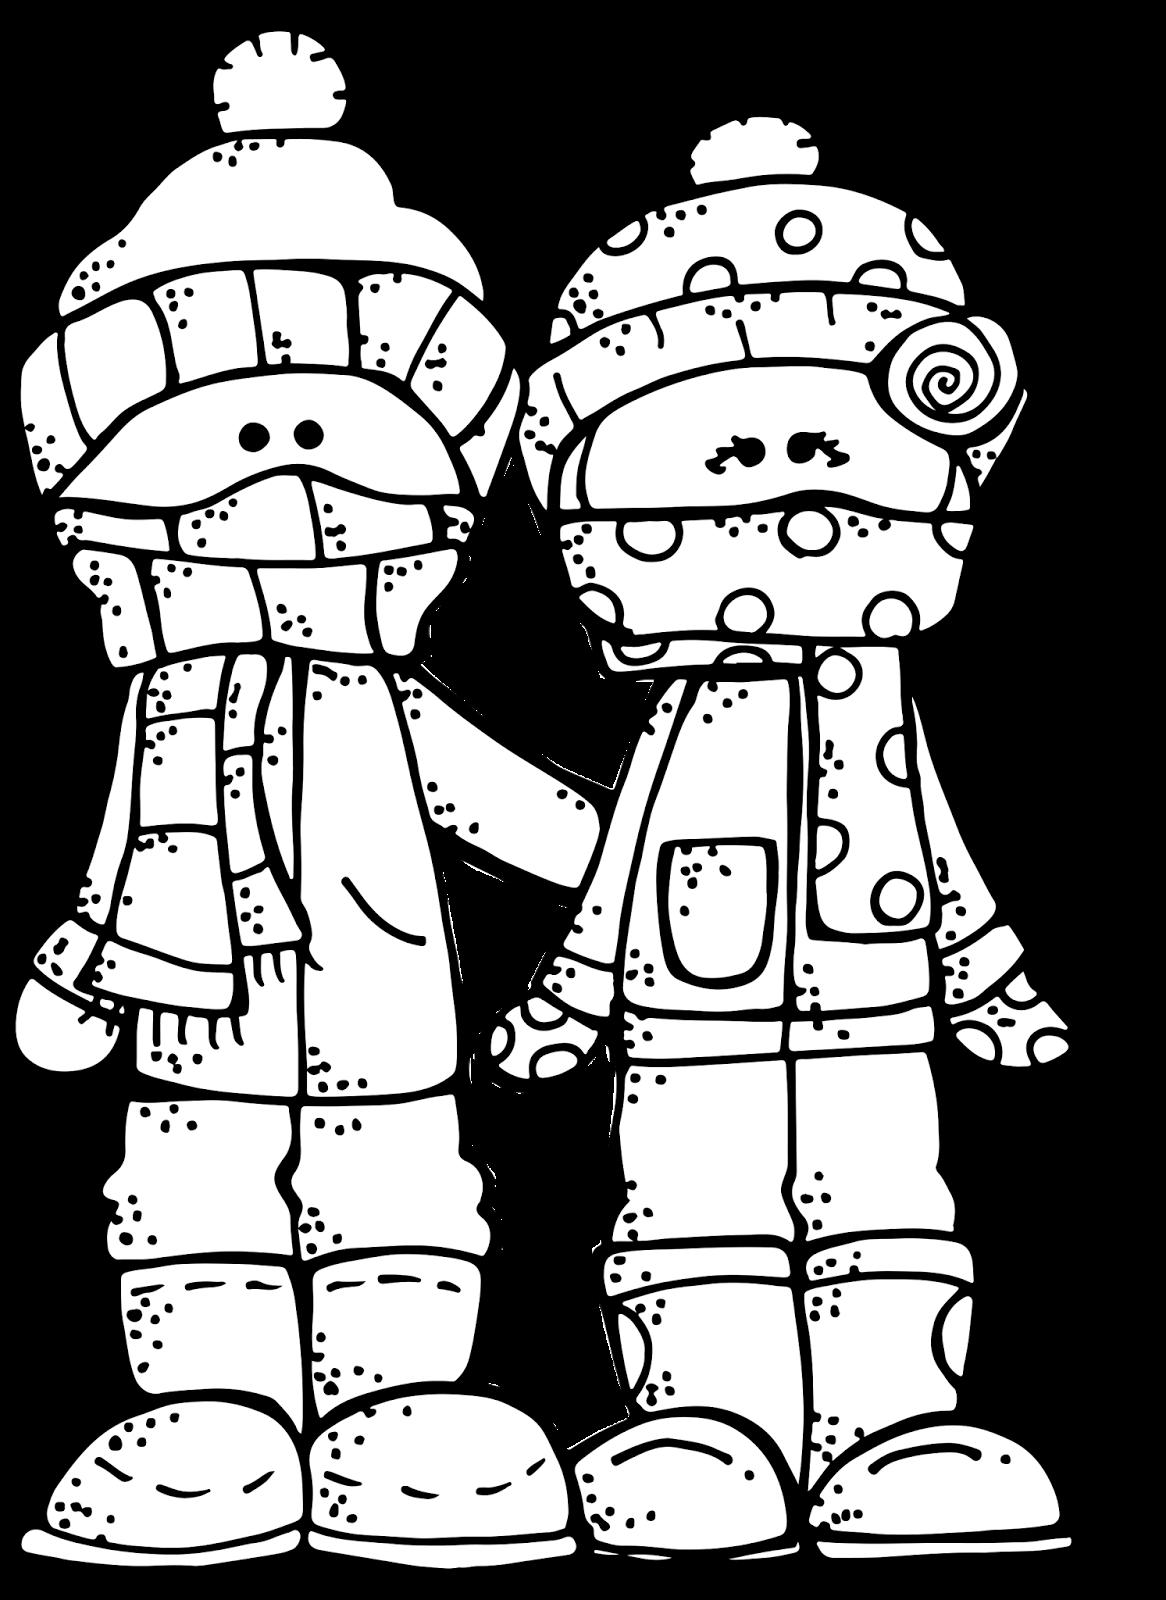 image freeuse download Year clipart winter. Melonheadz lds illustrating freebie